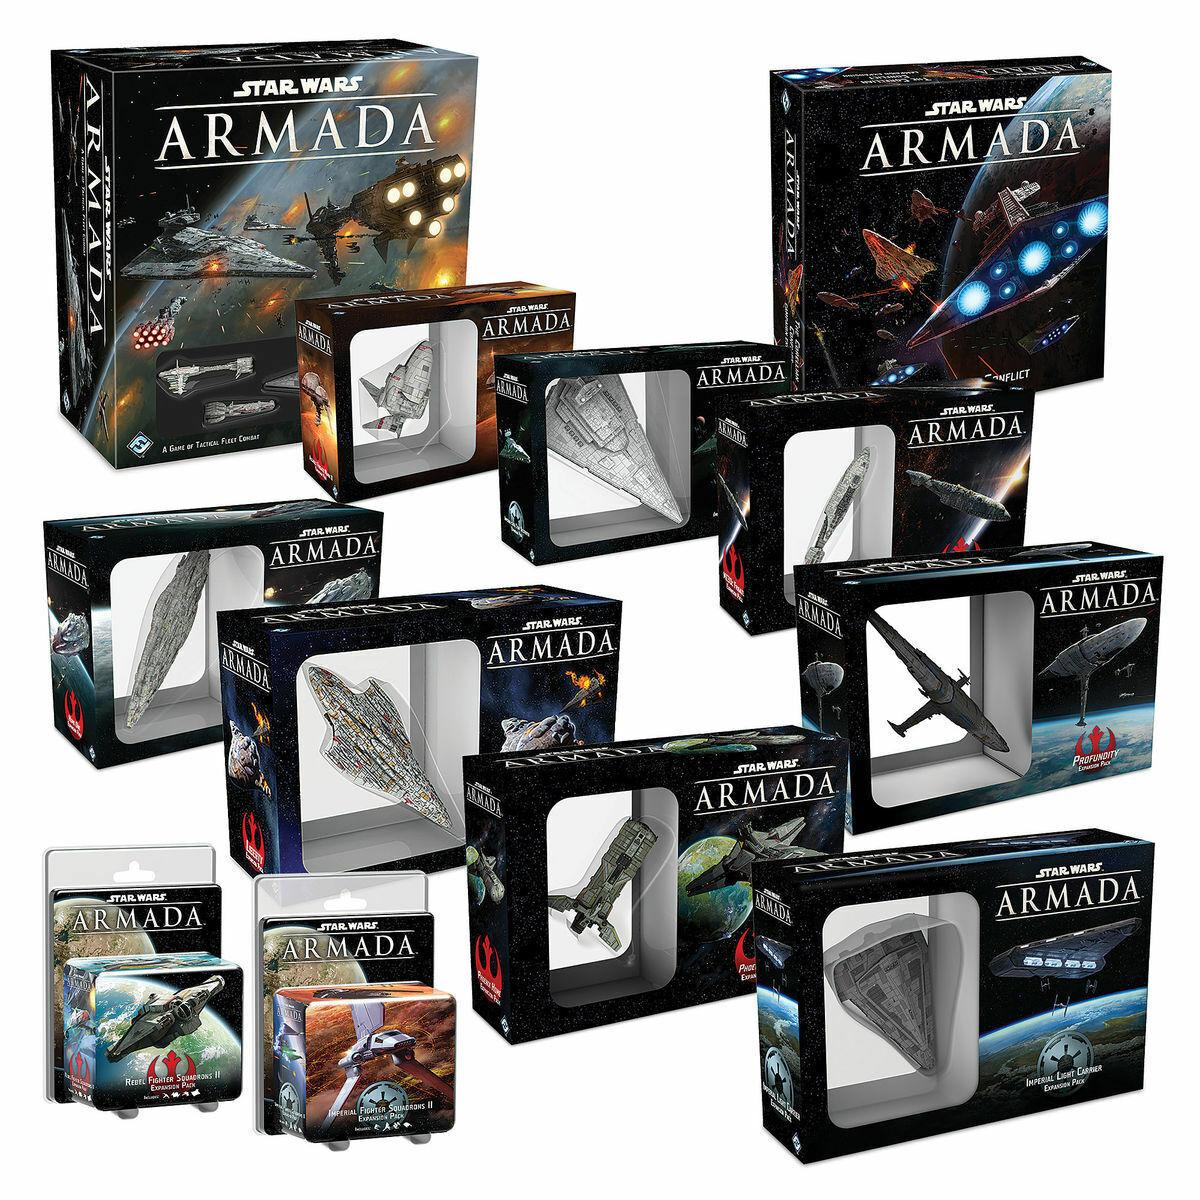 Star Wars ARMADA - Core Set, Expansions, Mats, Feldherr Foam Multi-Listing - NEW